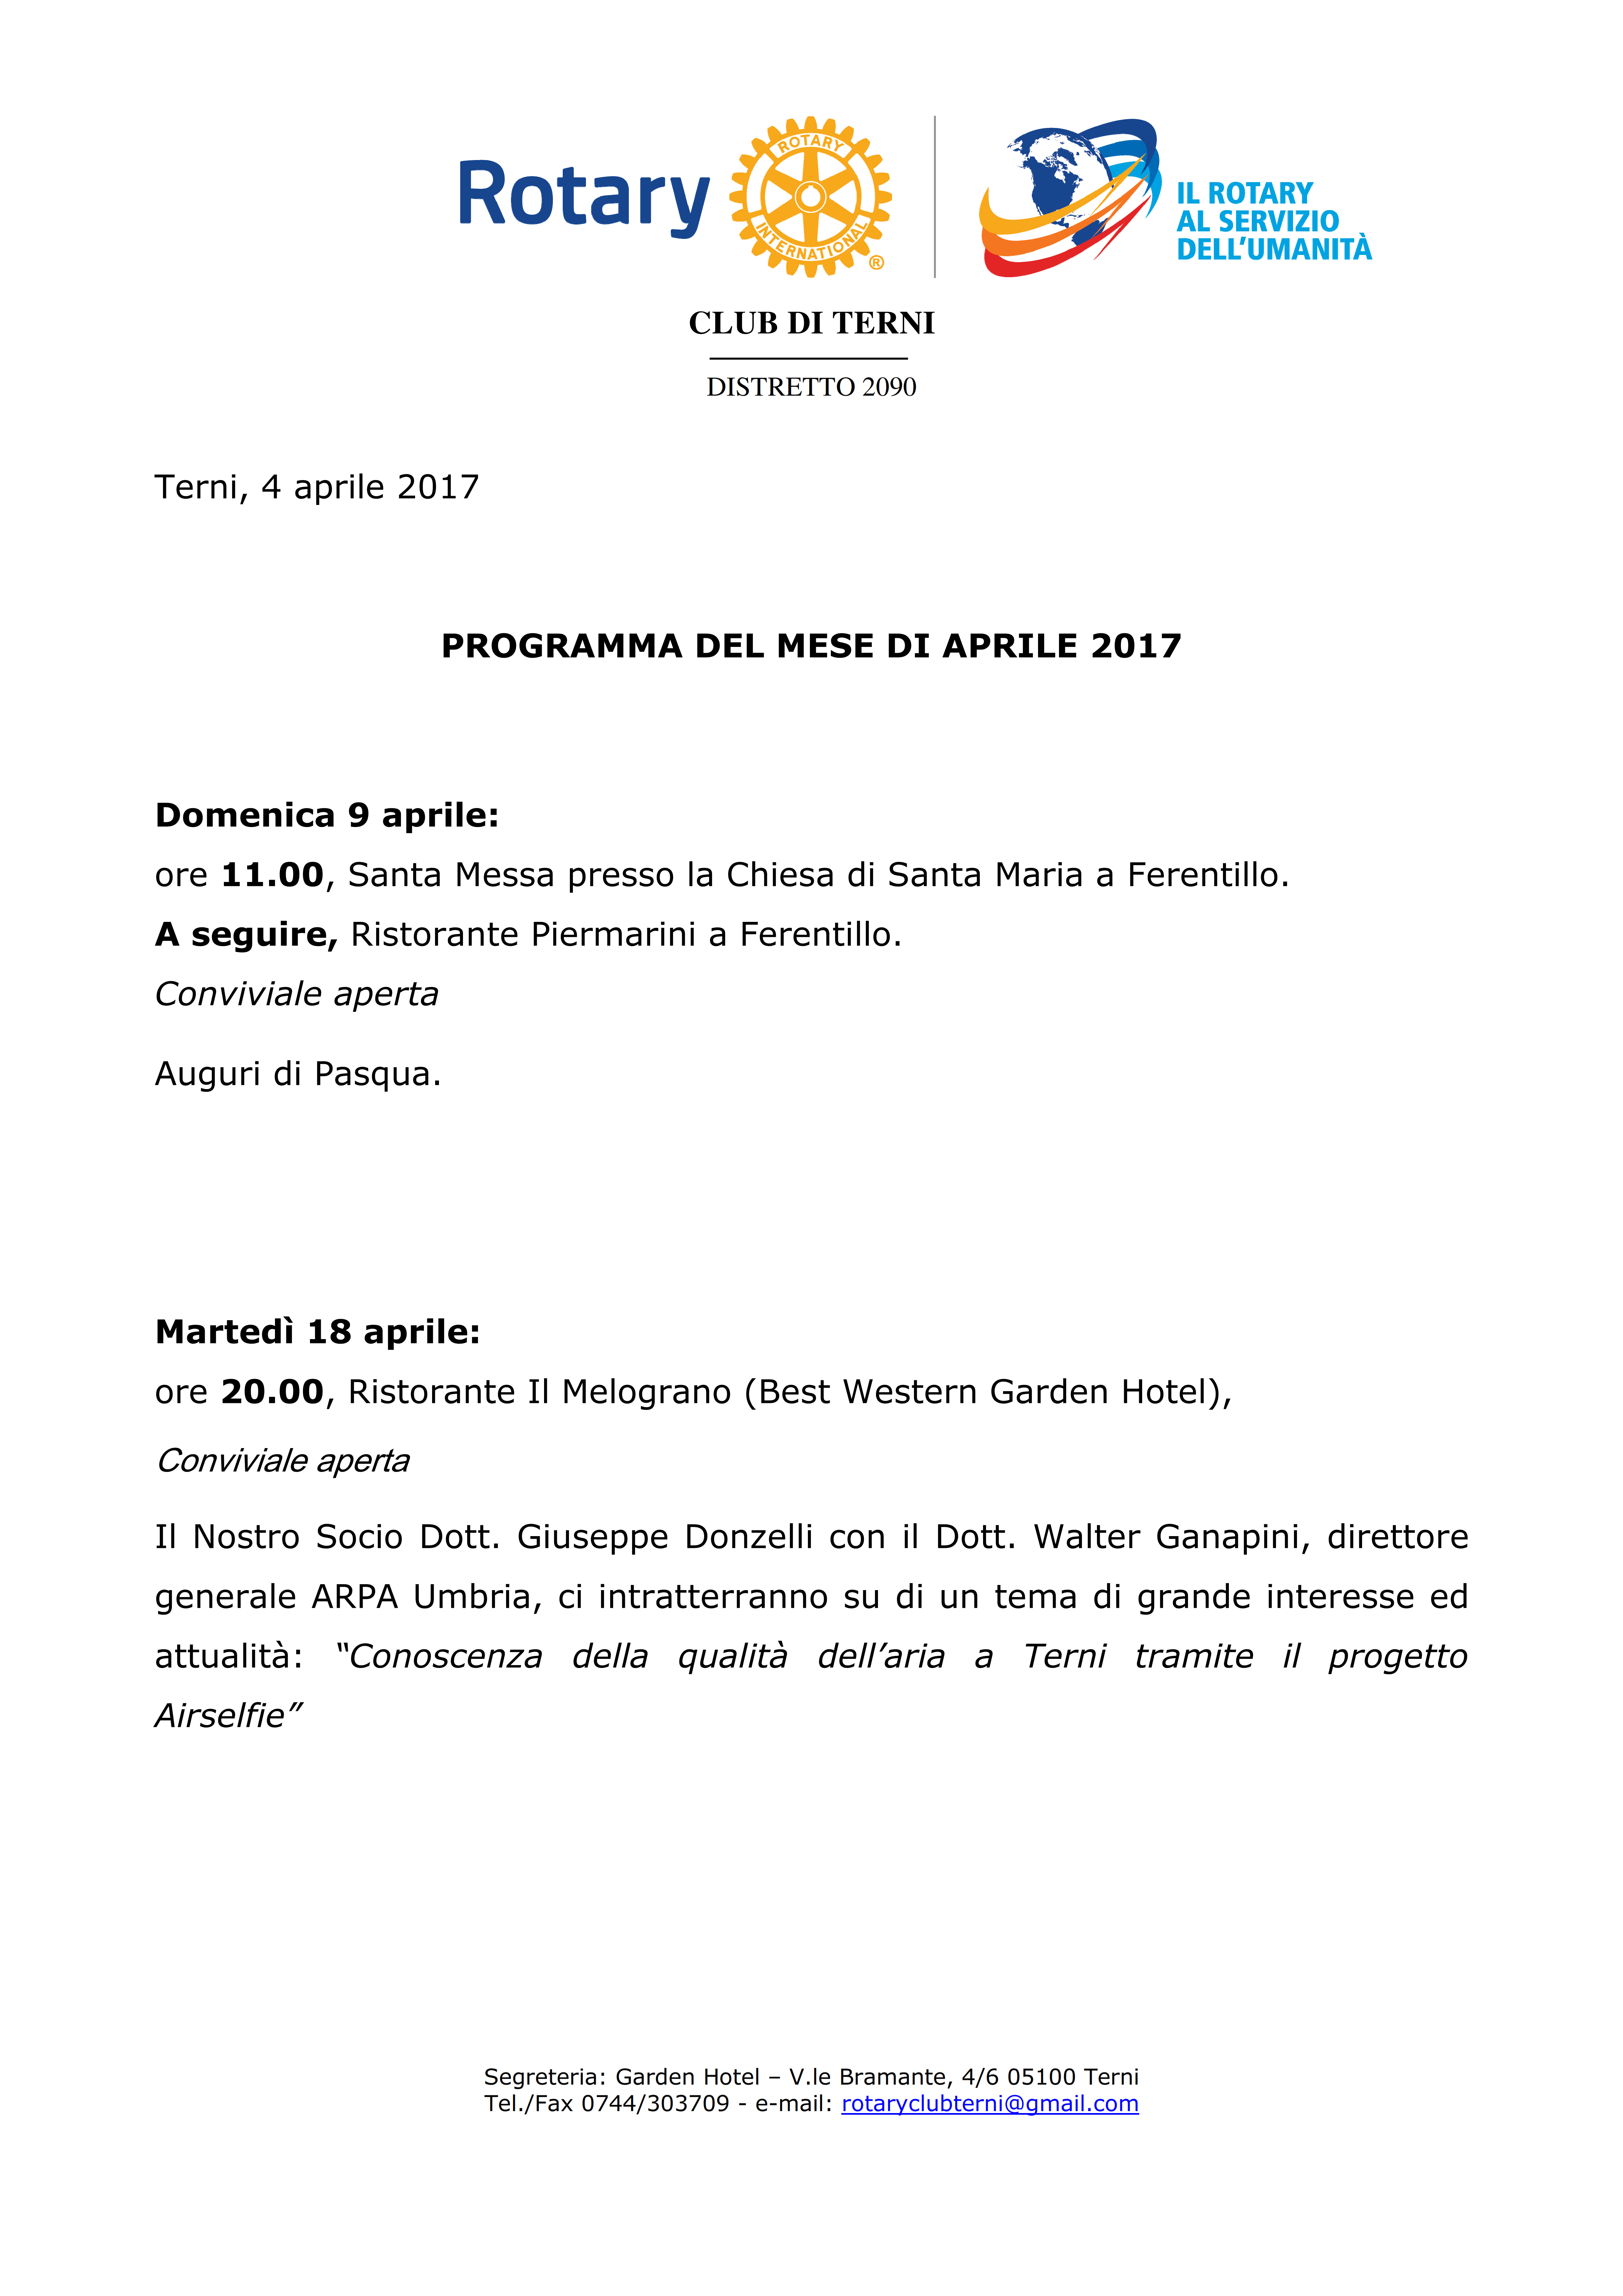 Rotary Club Terni - Programma Aprile 2017_001